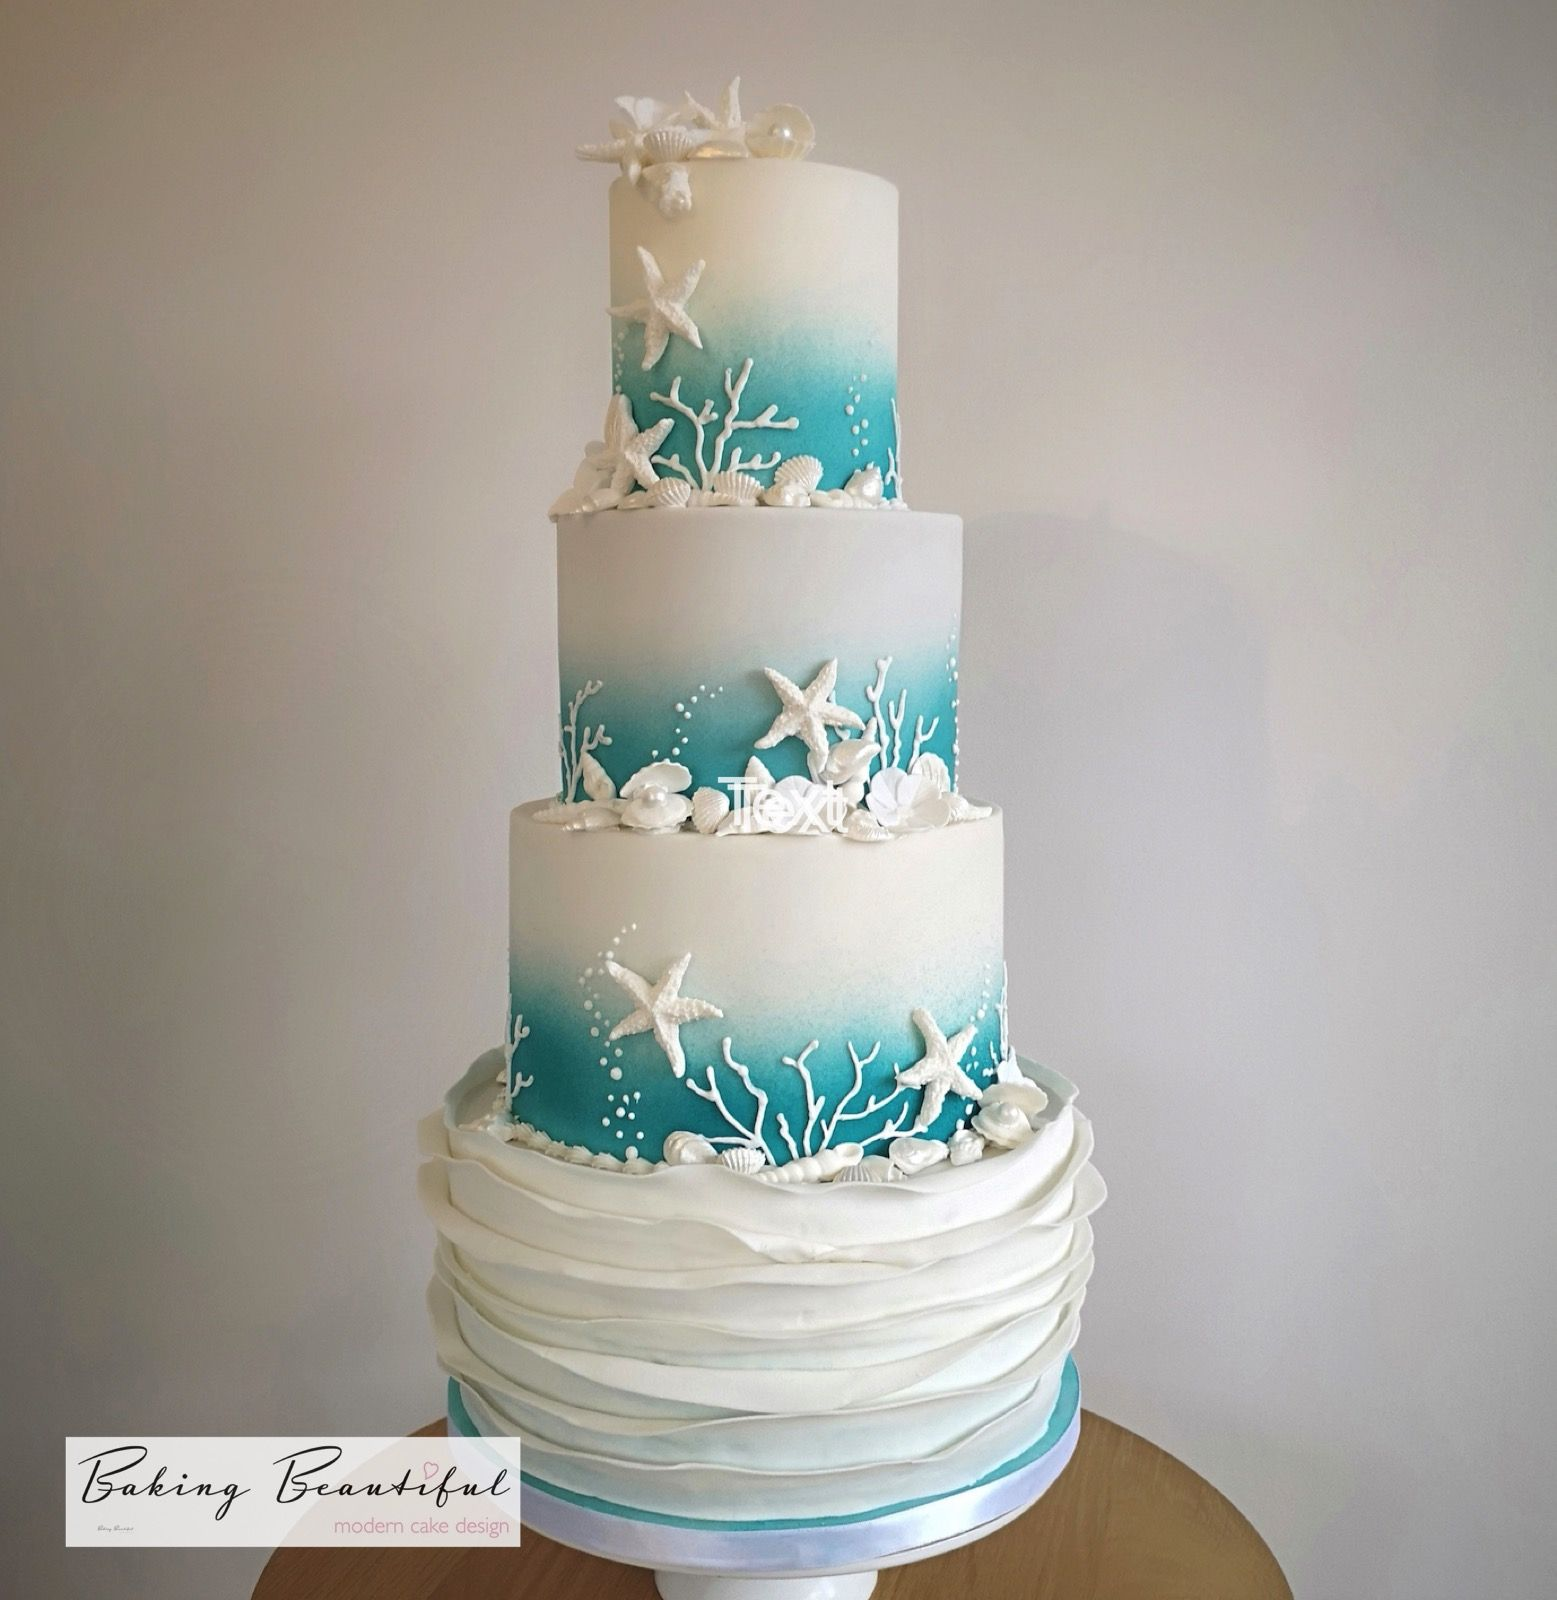 Home With Images Beach Wedding Cake Beach Theme Wedding Cakes